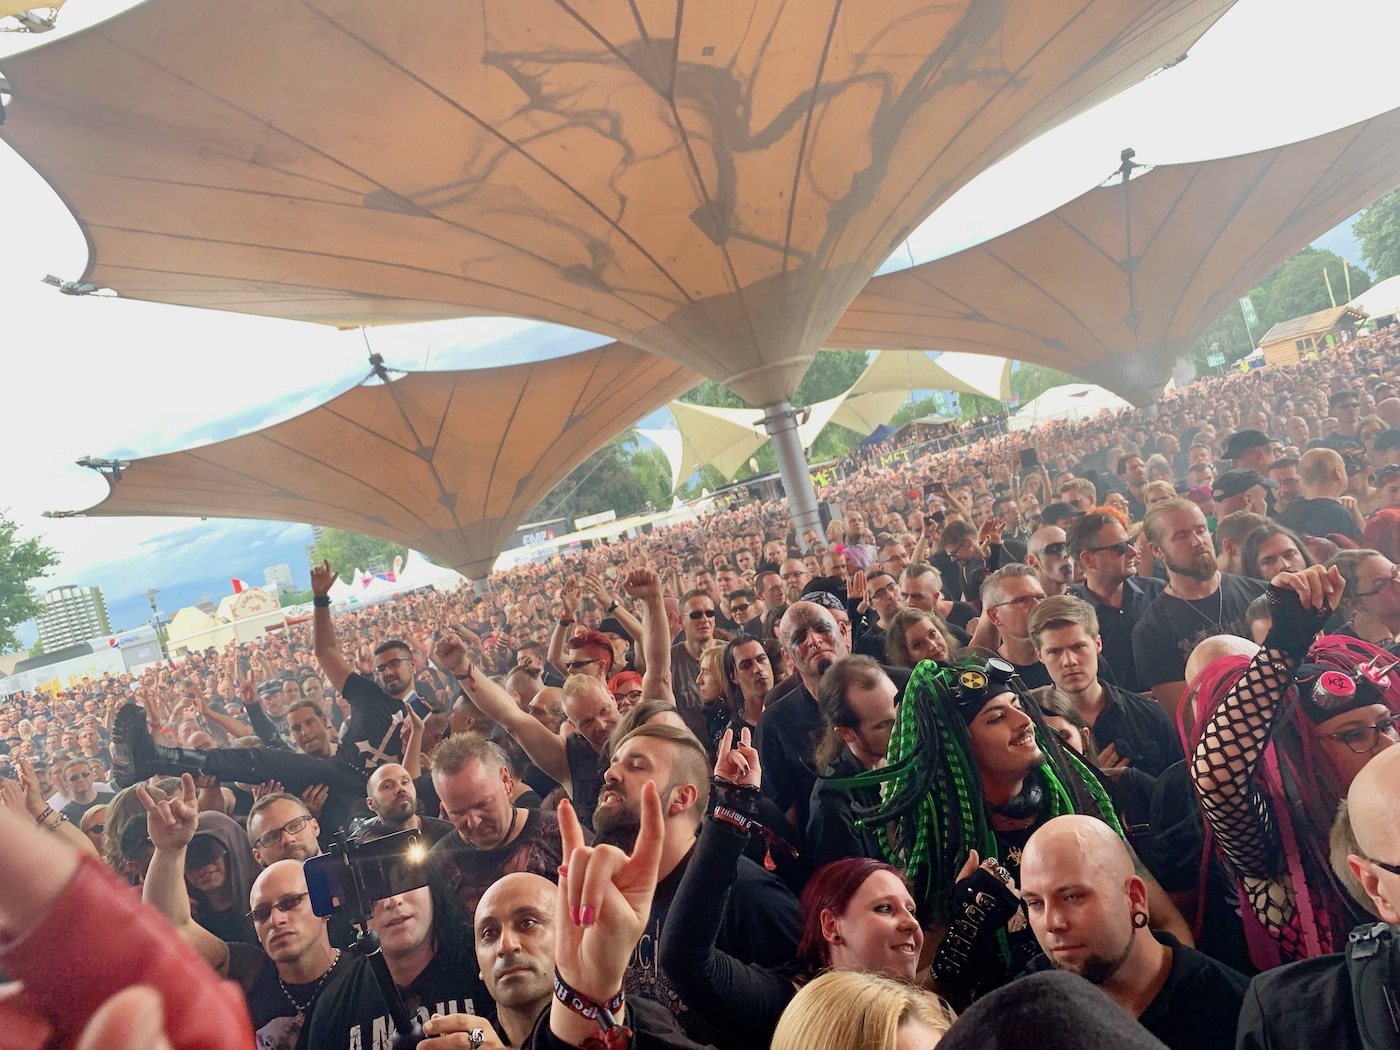 mark_benecke_amphi_festival_koeln_2019 - 52.jpg